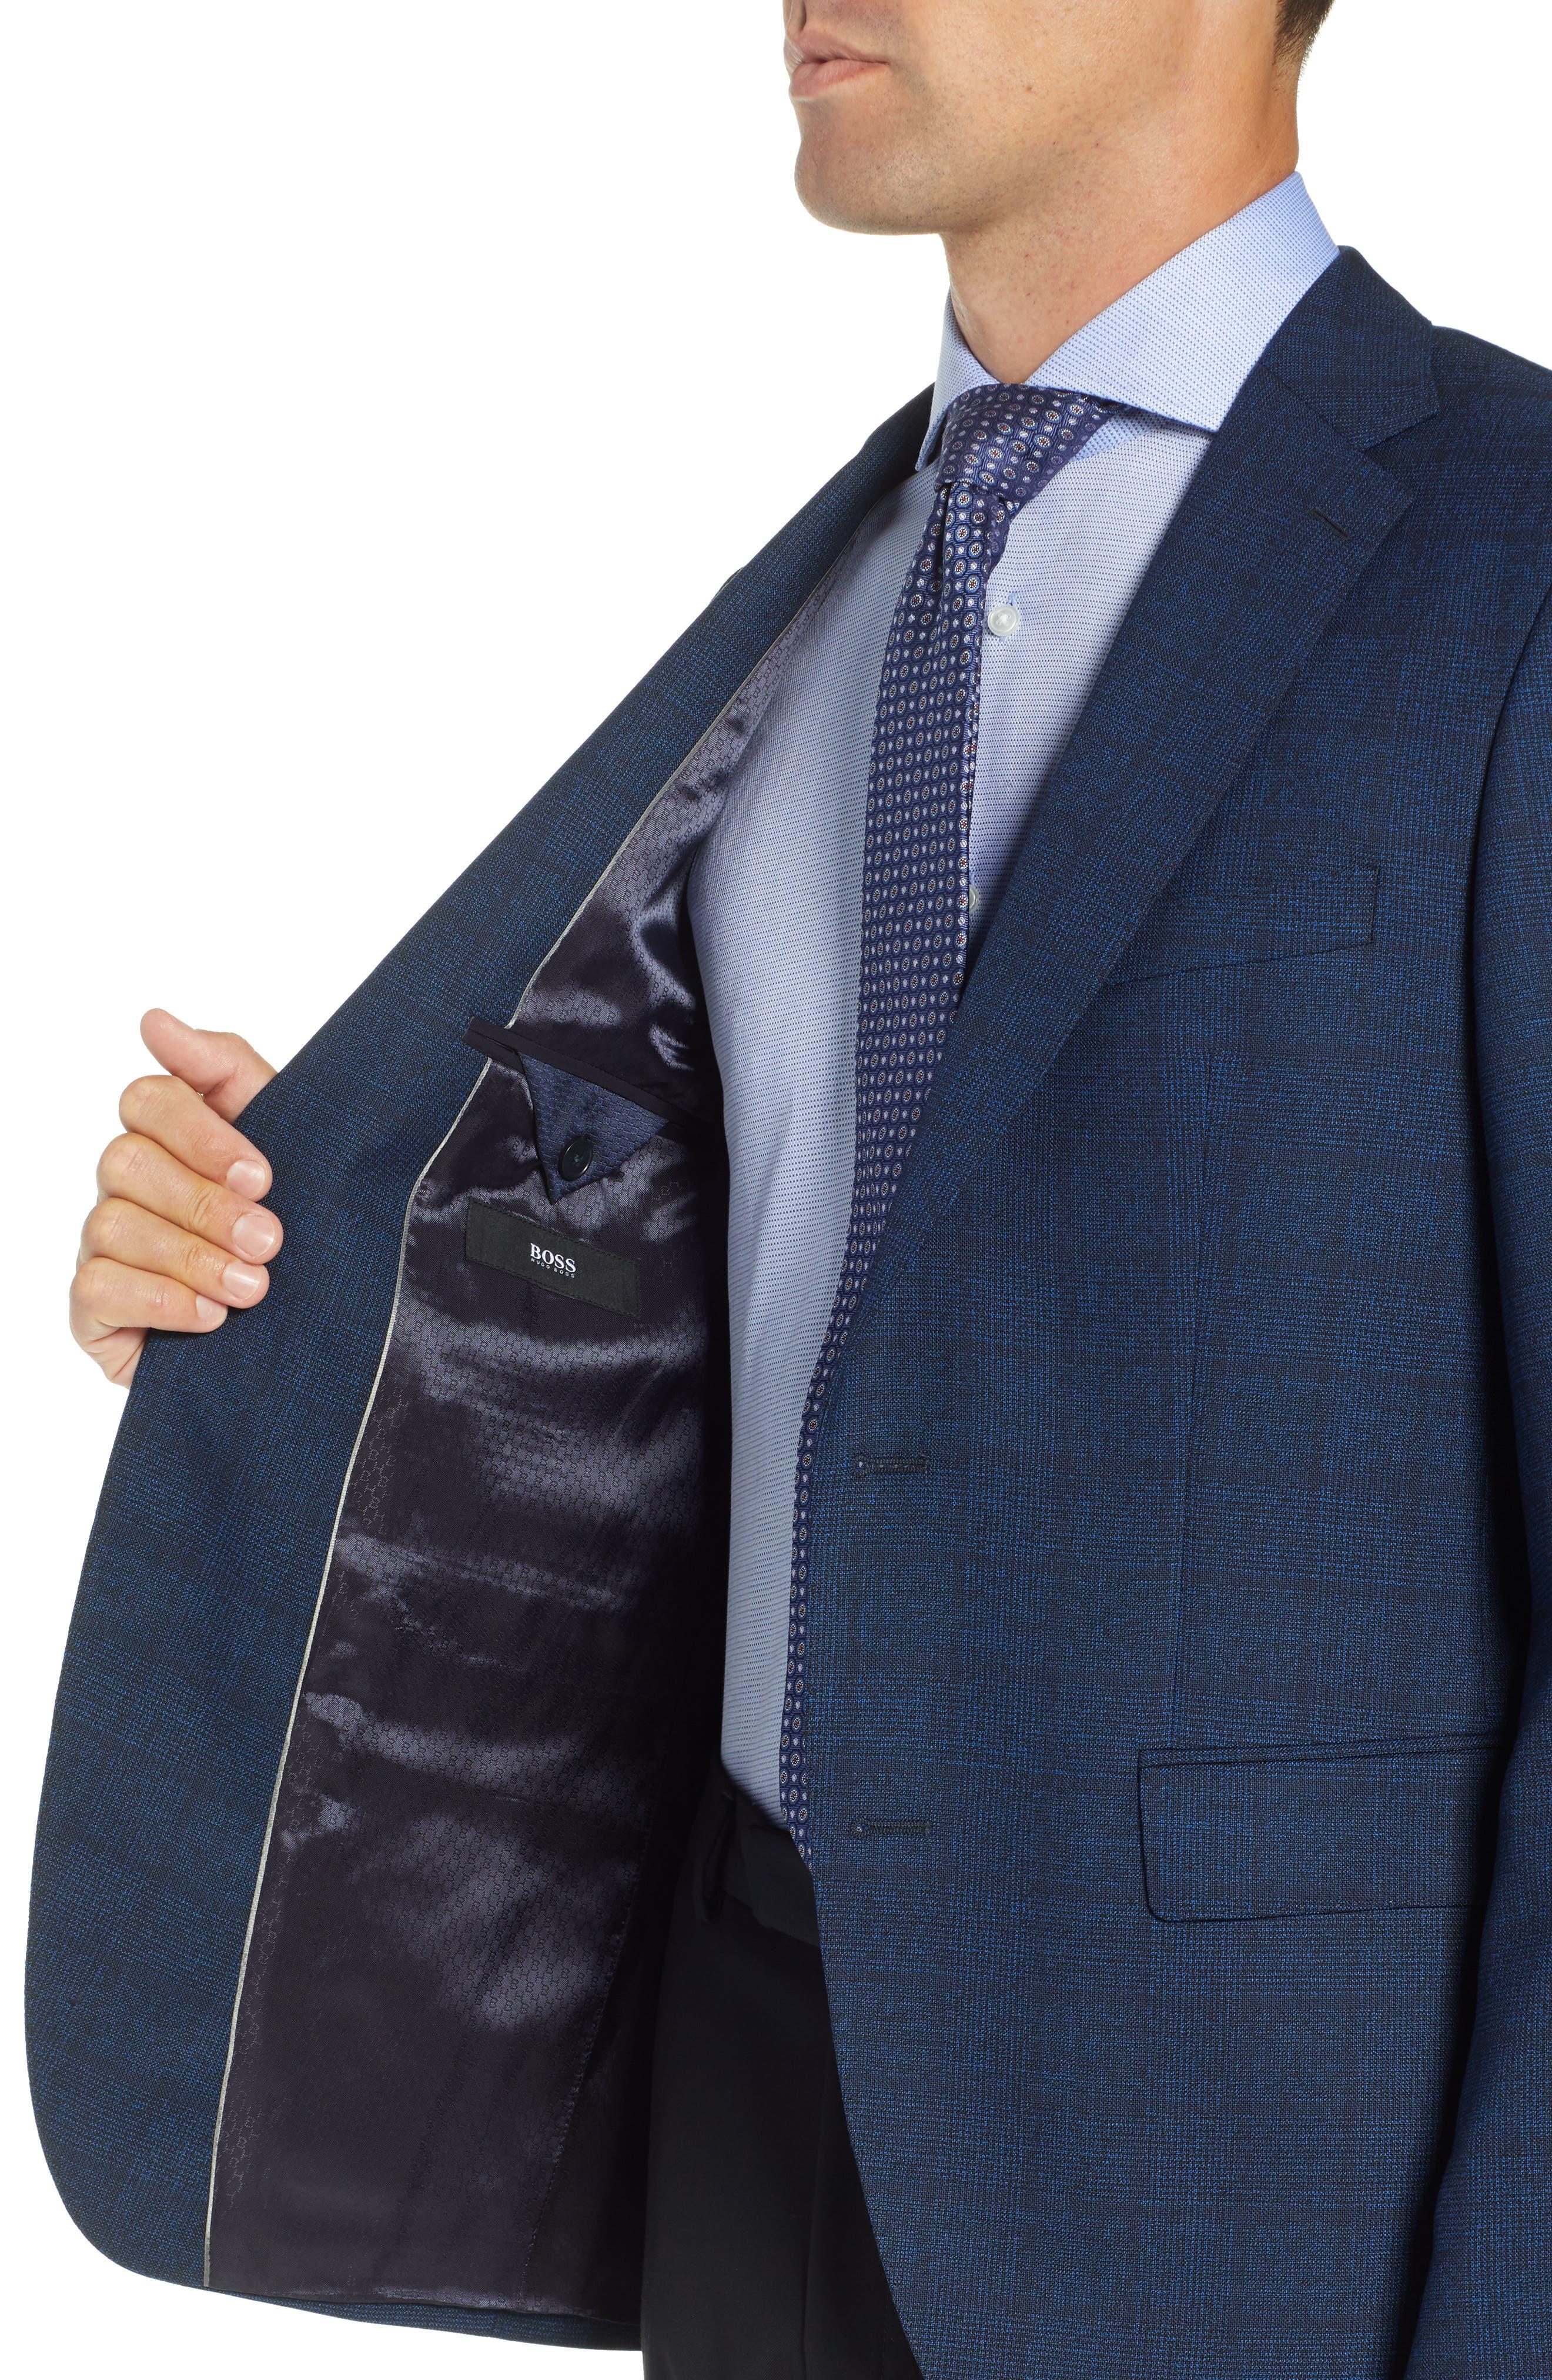 Jewels Classic Fit Plaid Wool Sport Coat,                             Alternate thumbnail 4, color,                             DARK BLUE